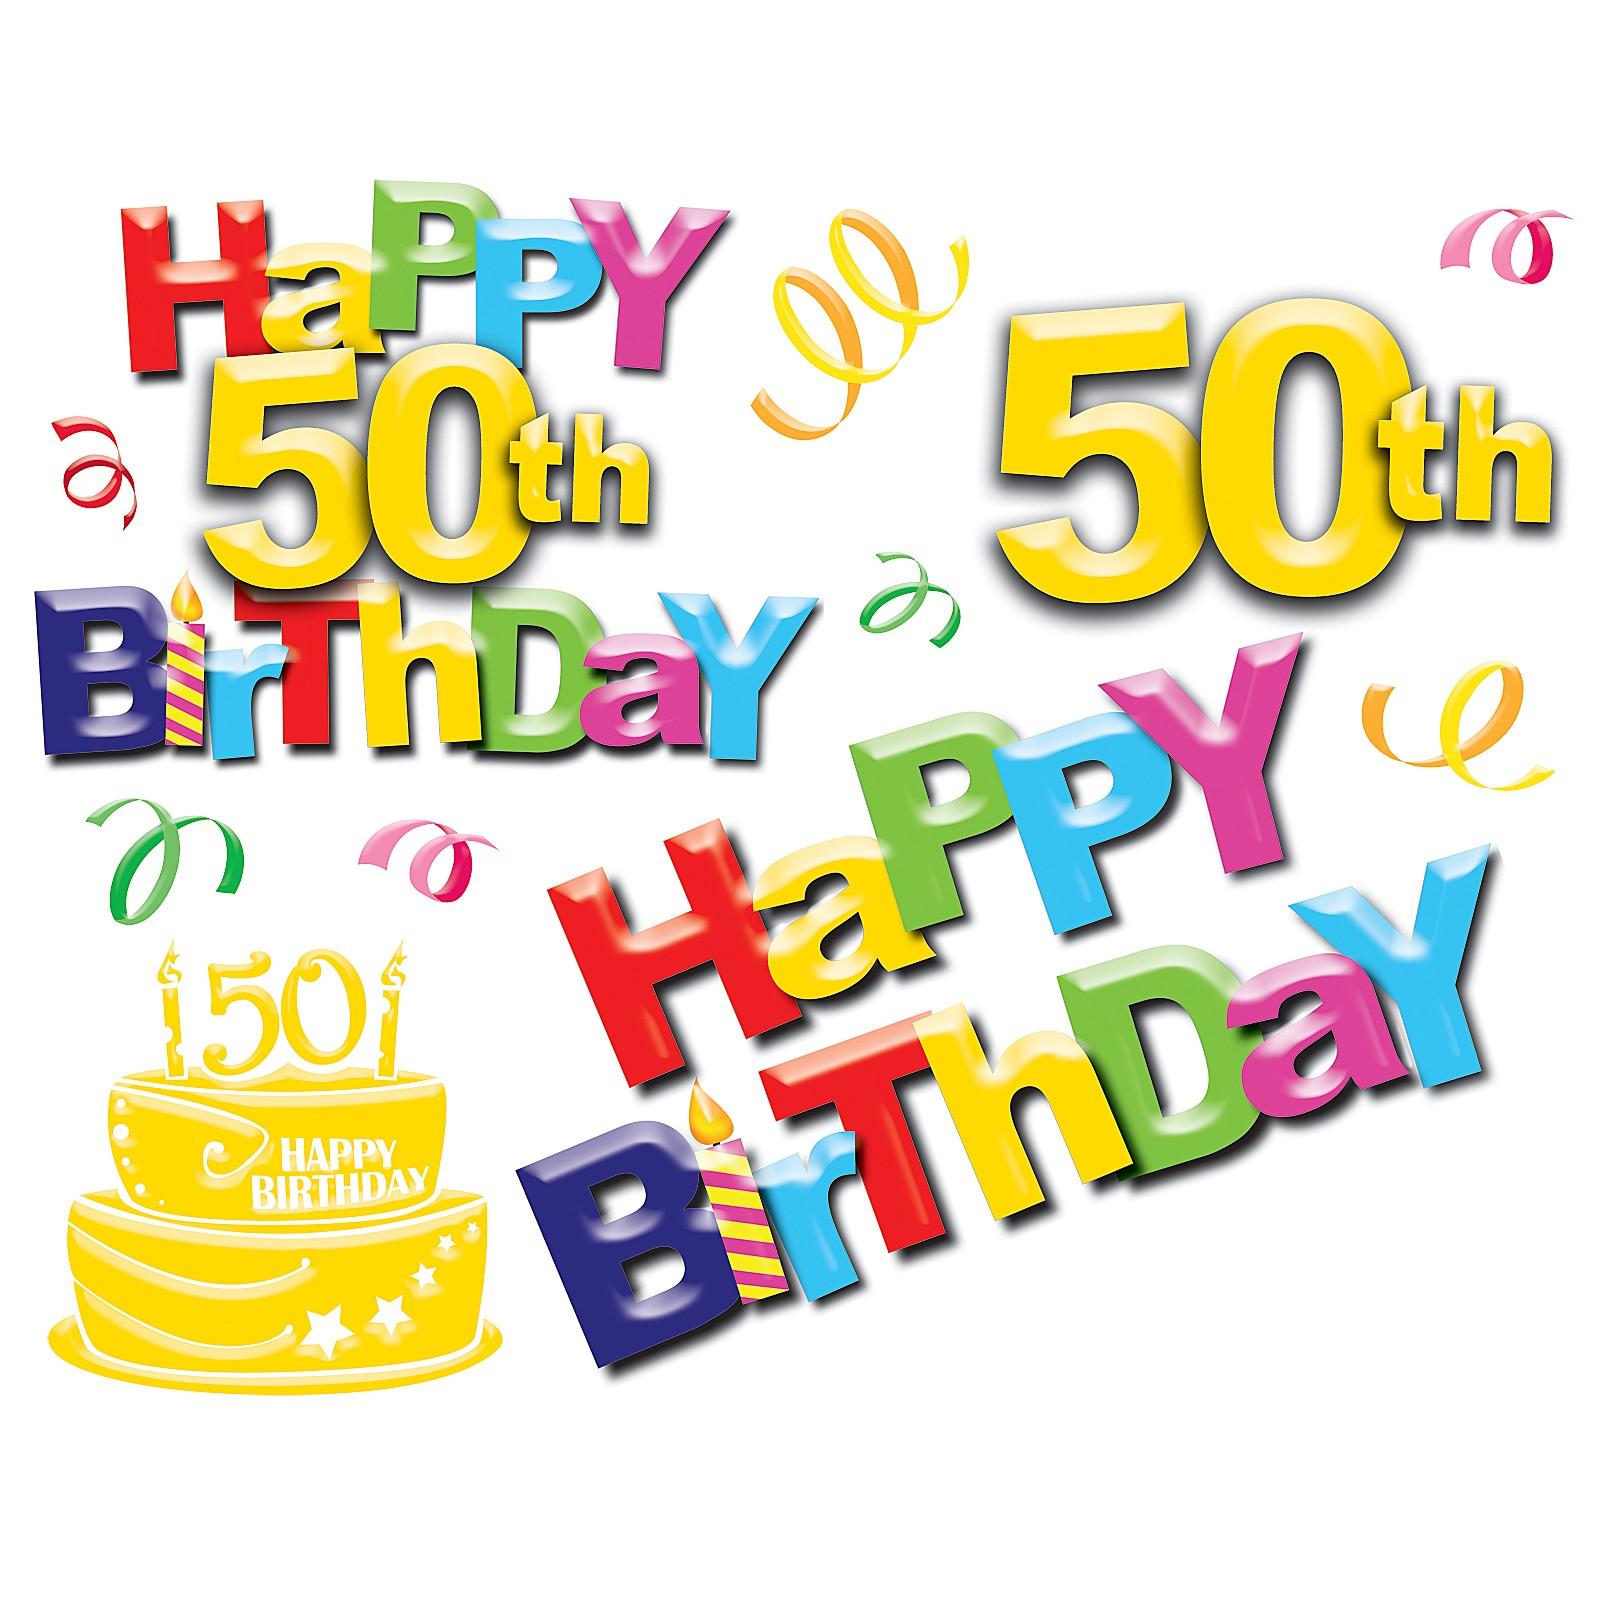 50Th Birthday Wallpaper